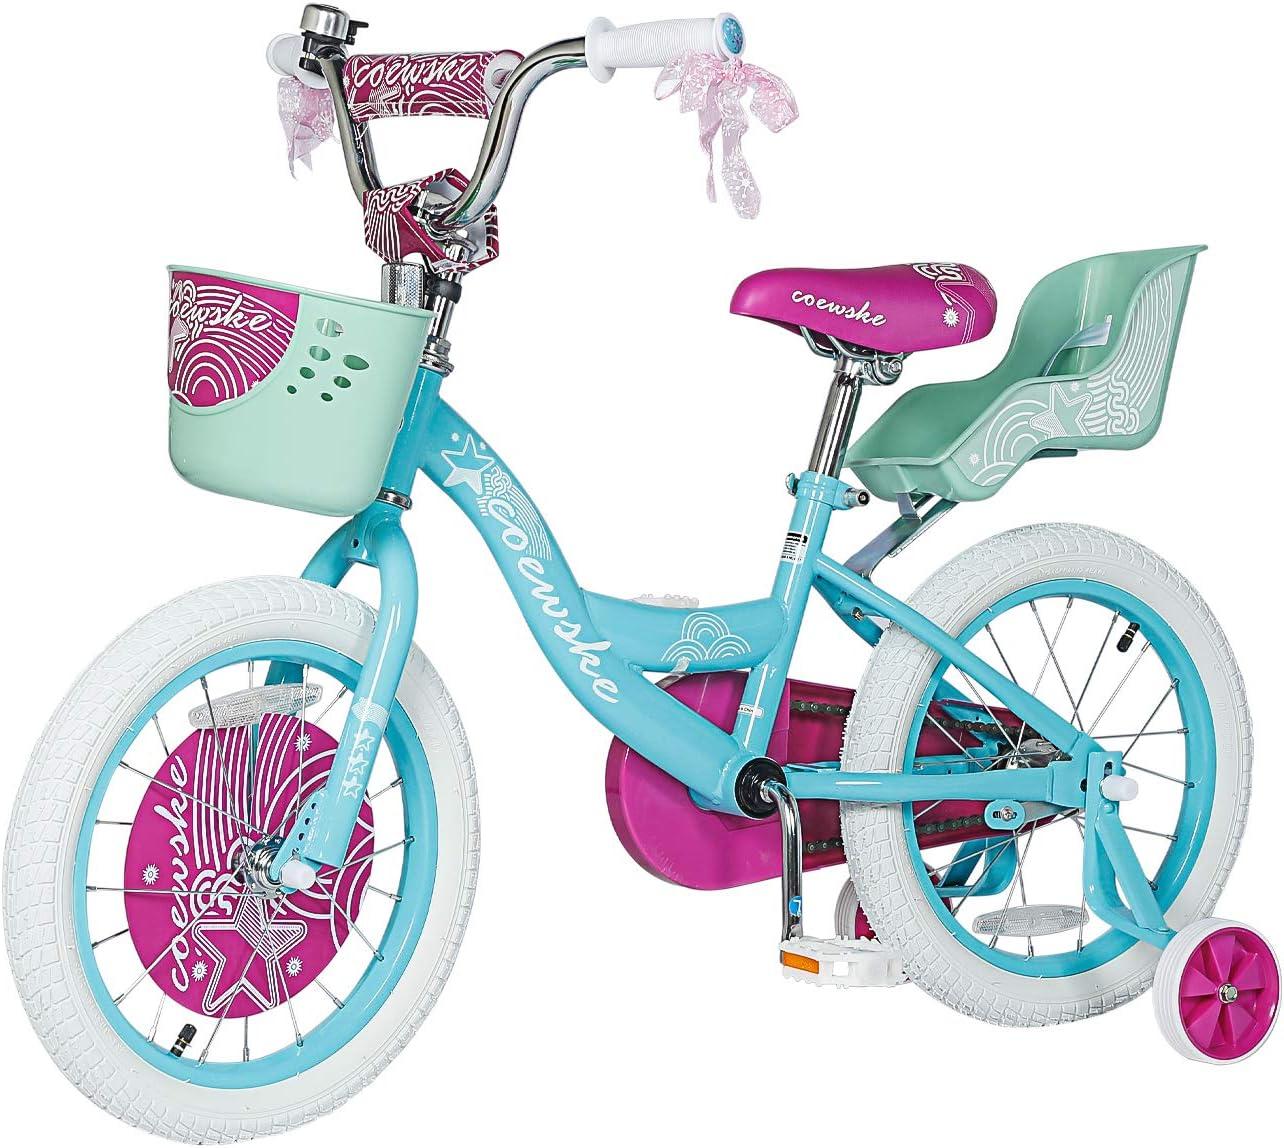 Schwinn Jasmine Kids Bicycle 16in wheel size girls purple age 4 to 7 with training wheels Renewed